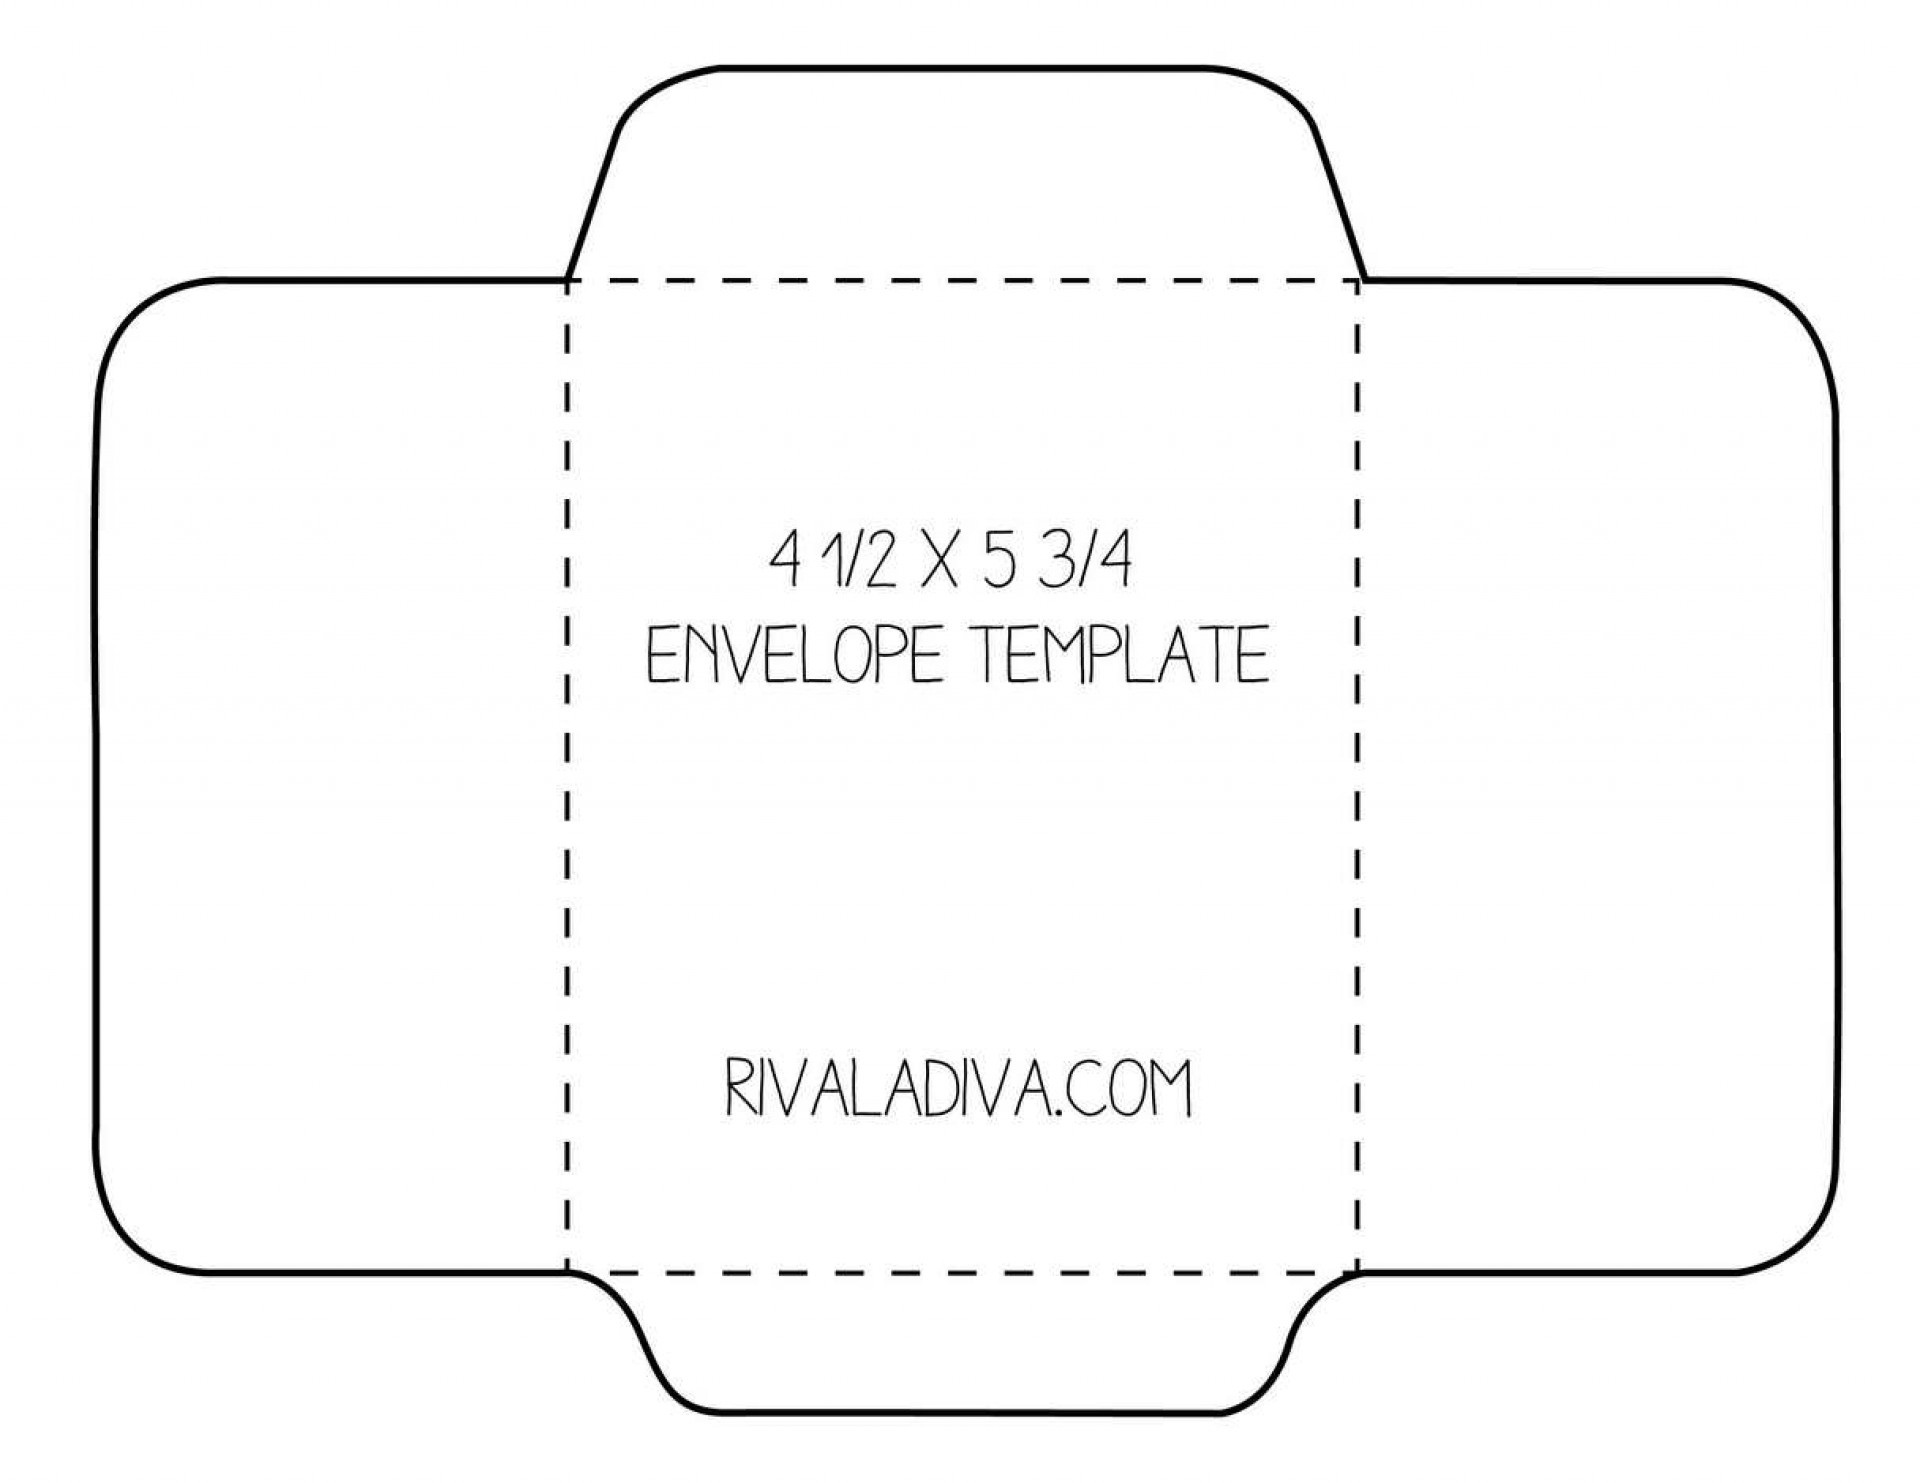 018 Free Printable Envelope Templates Fake Insurance Cards With Gift - Free Printable Gift Card Envelope Template